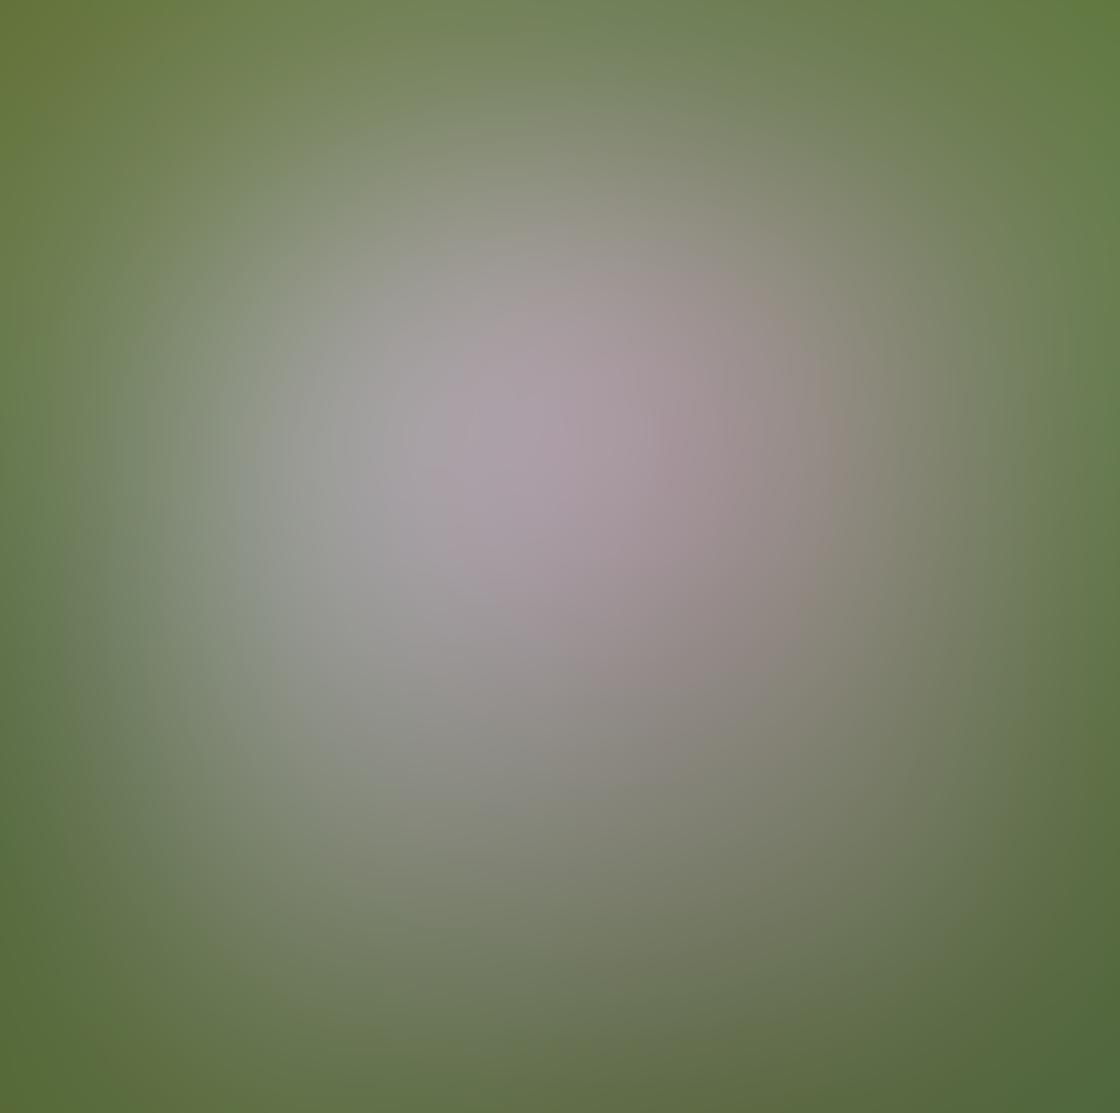 iPhone Ollocase Olloclip Active Lens 28